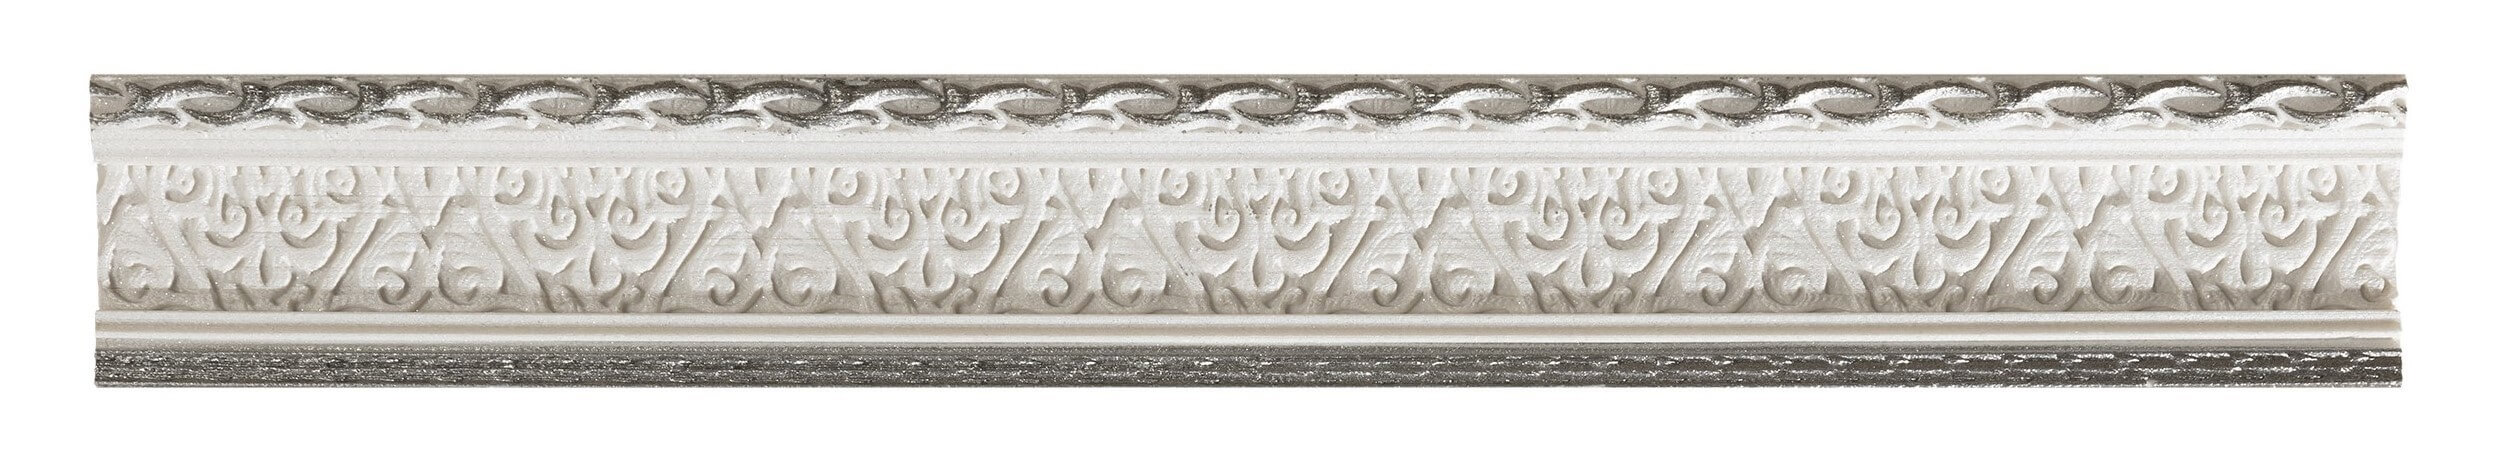 Бордюр Azulev Mold Delice Blanco 4x29 бордюр adex neri relieve clasico blanco z 7 5x15